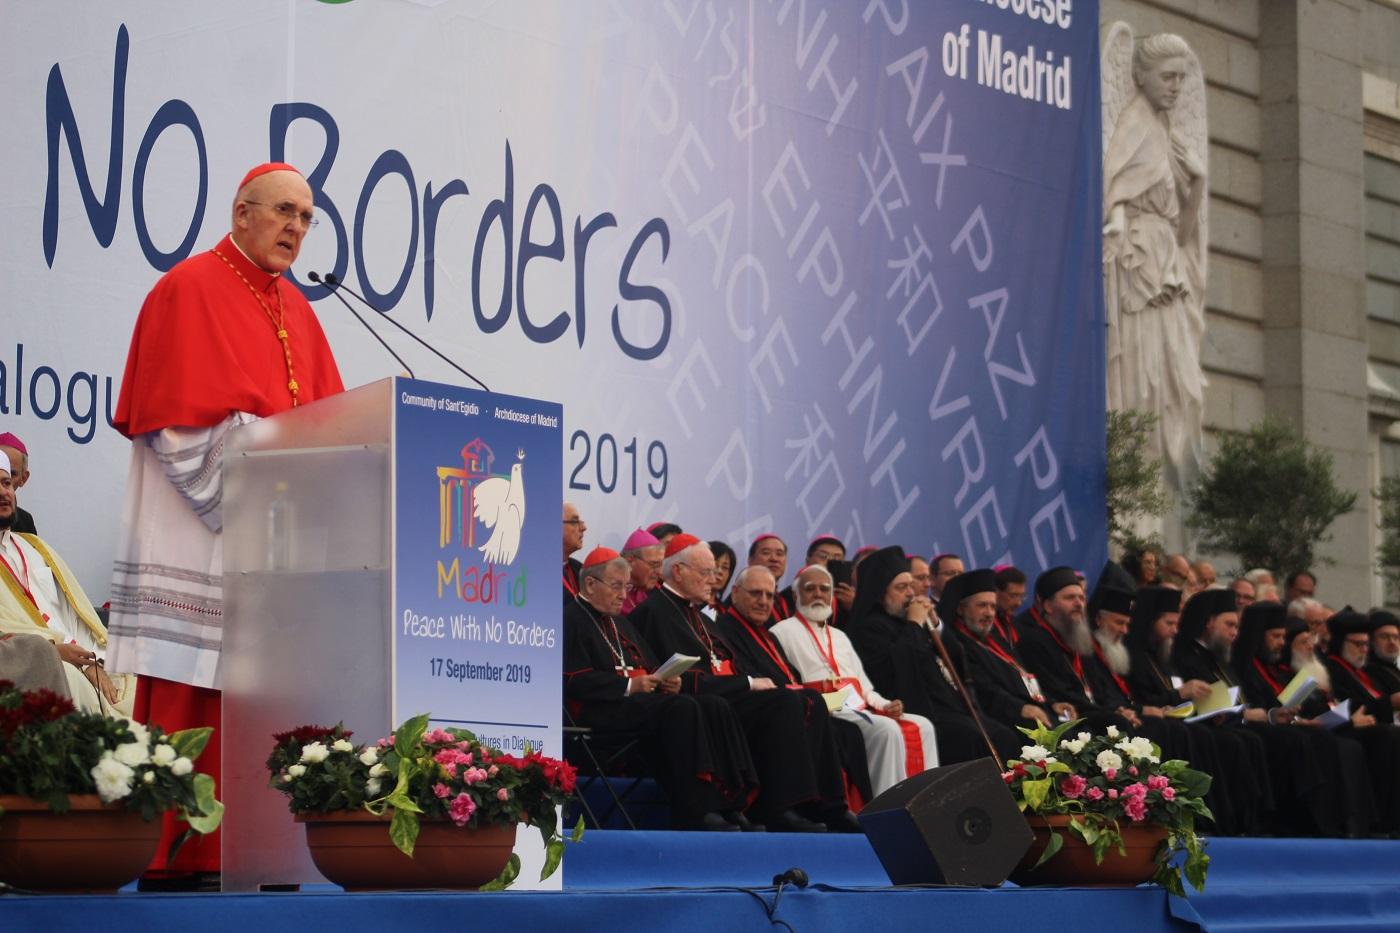 clausura paz sin fronteras osoro